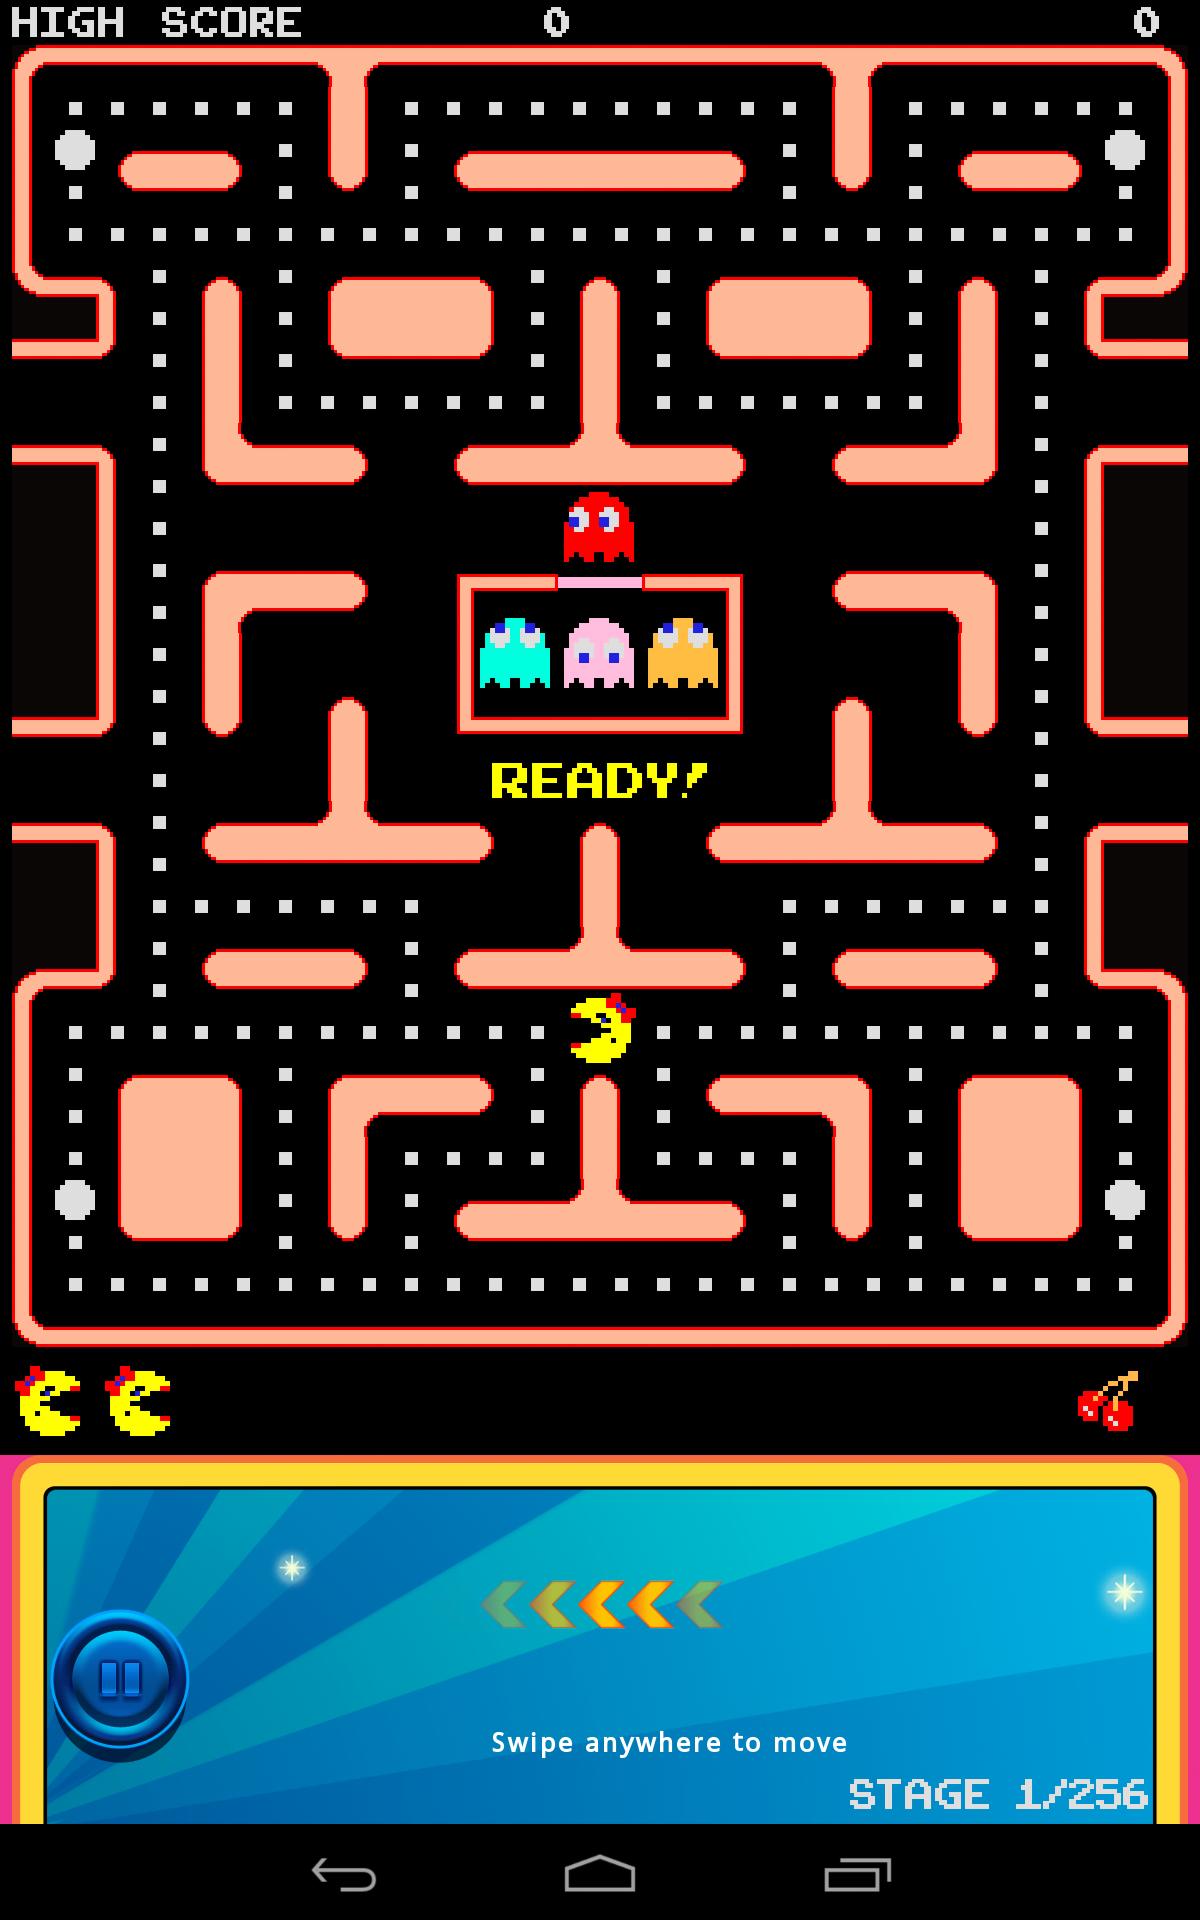 Ms. PAC-MAN by Namco screenshot #3